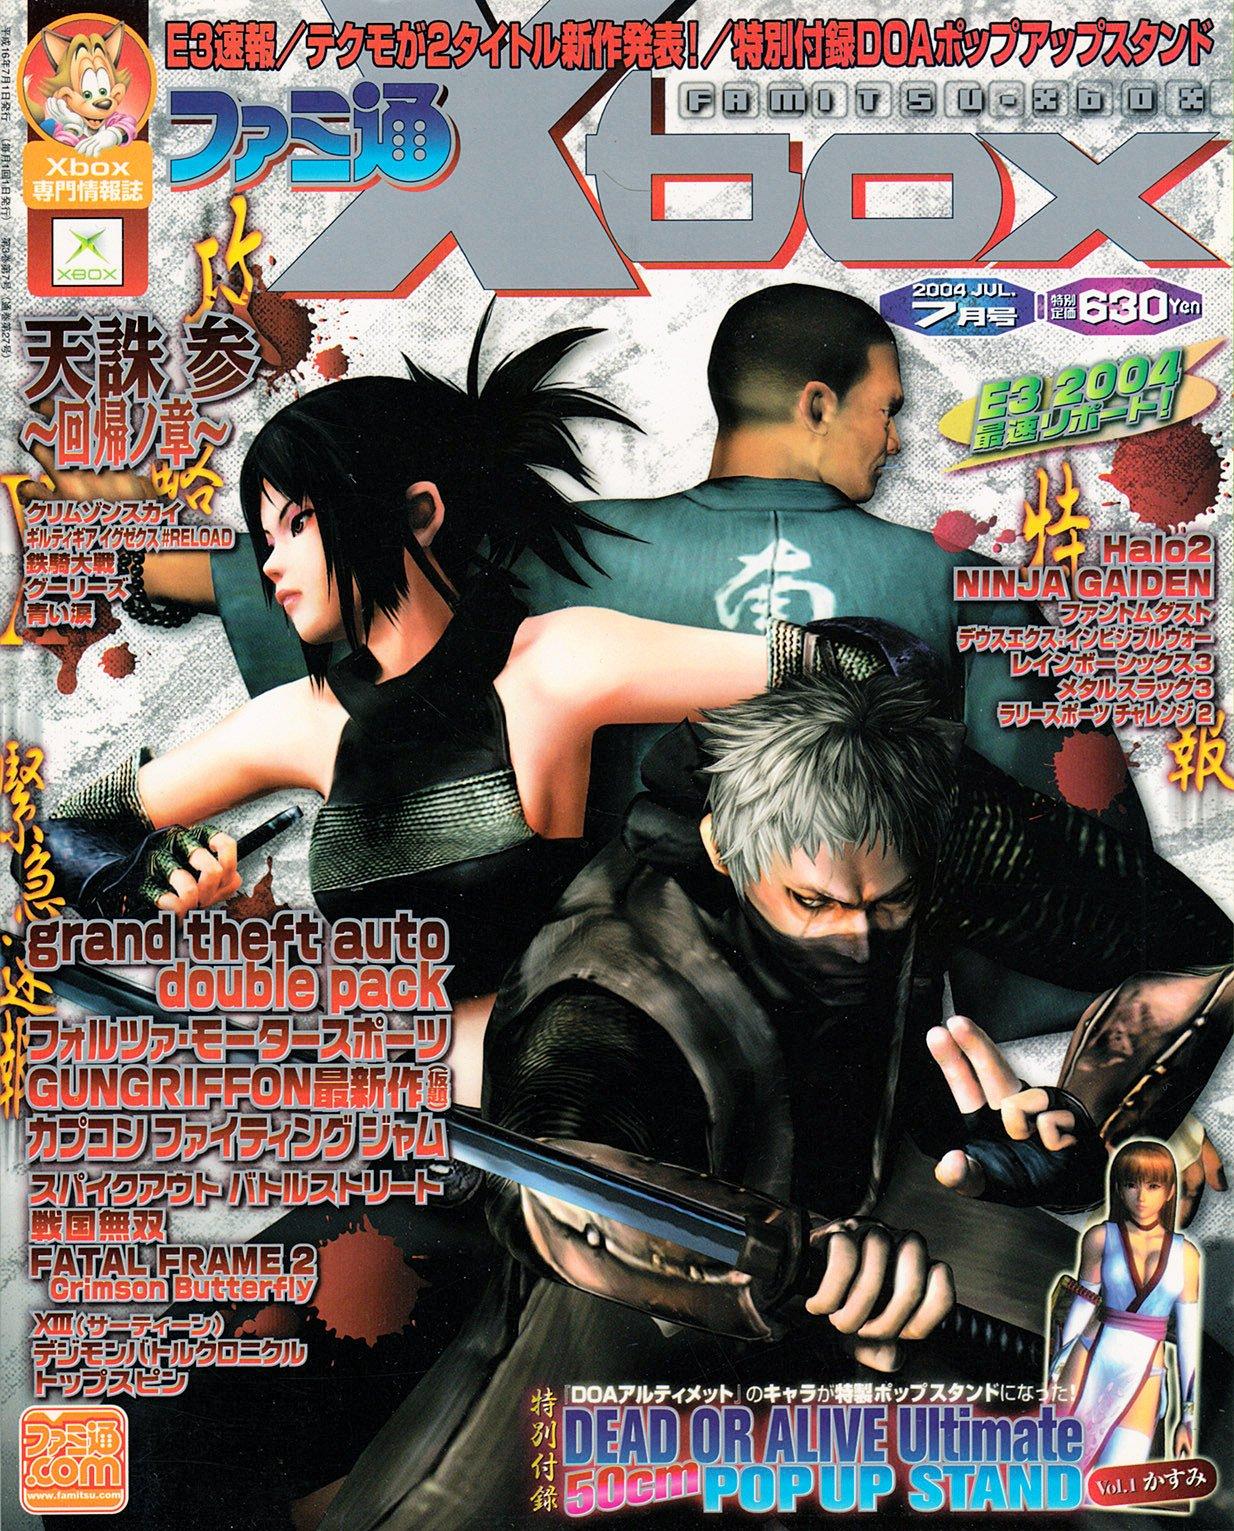 Famitsu Xbox Issue 029 (July 2004)